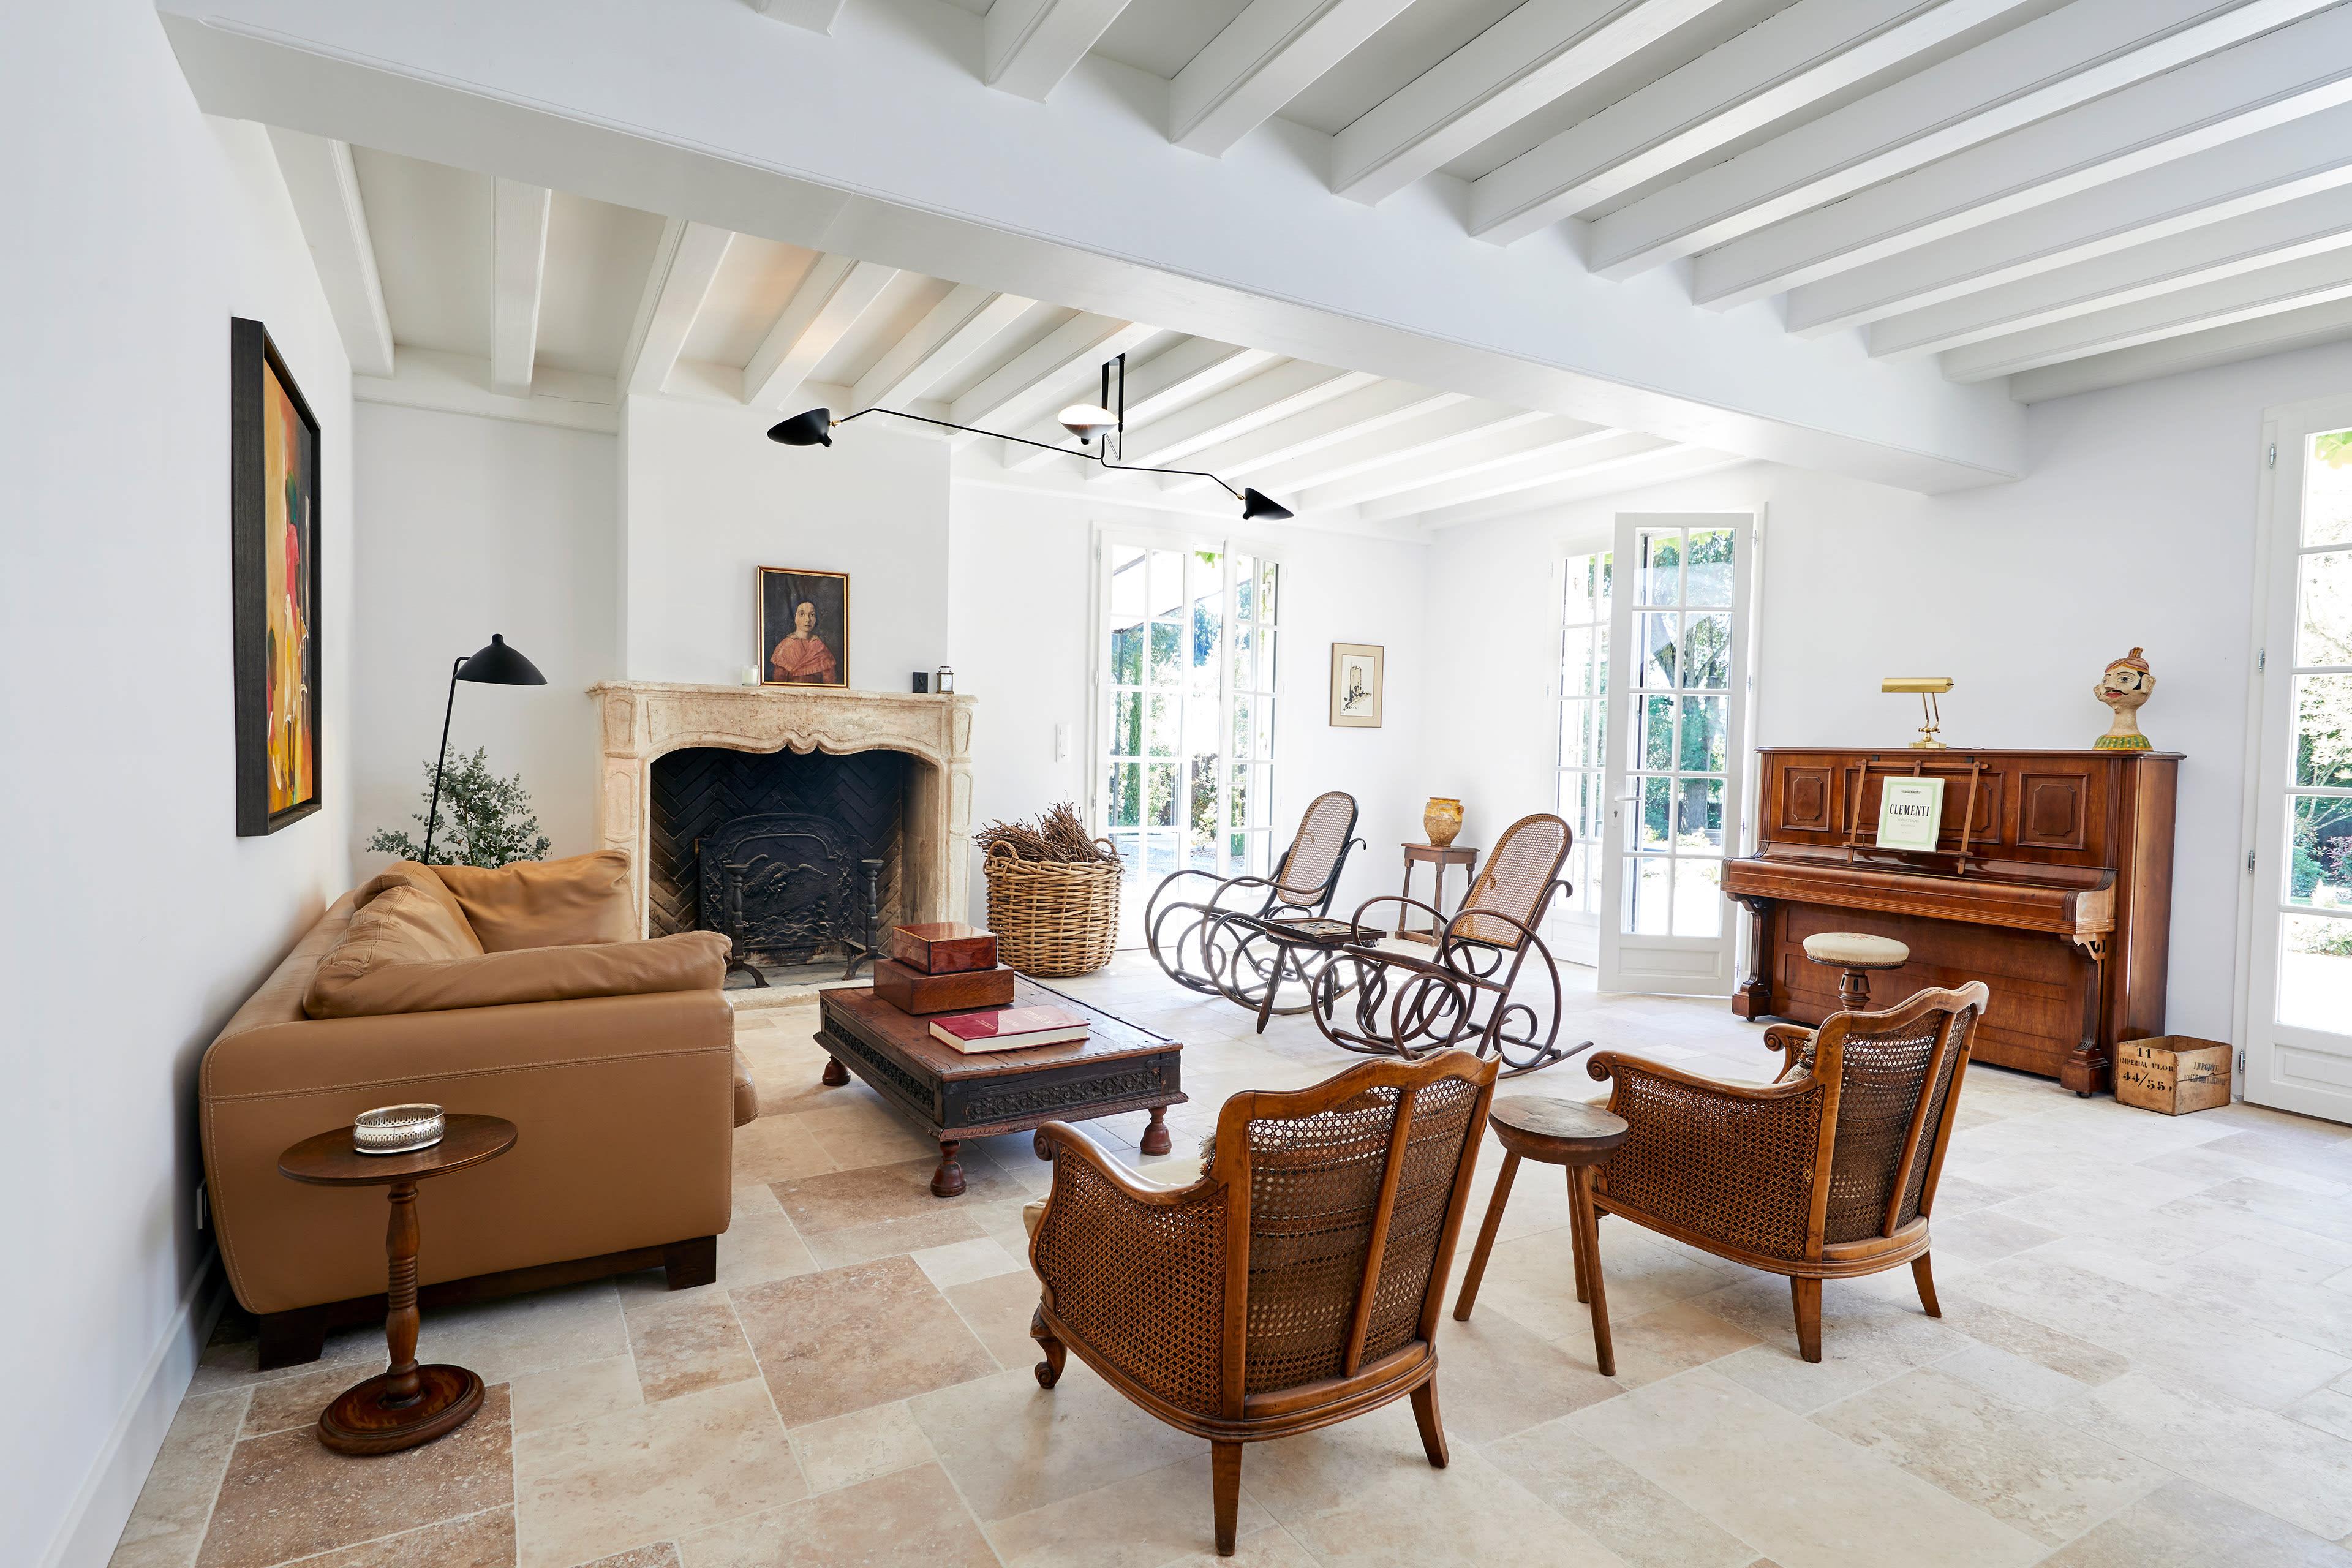 Richard Moran Pomoeria Luxury Interiors Lifestyle 013